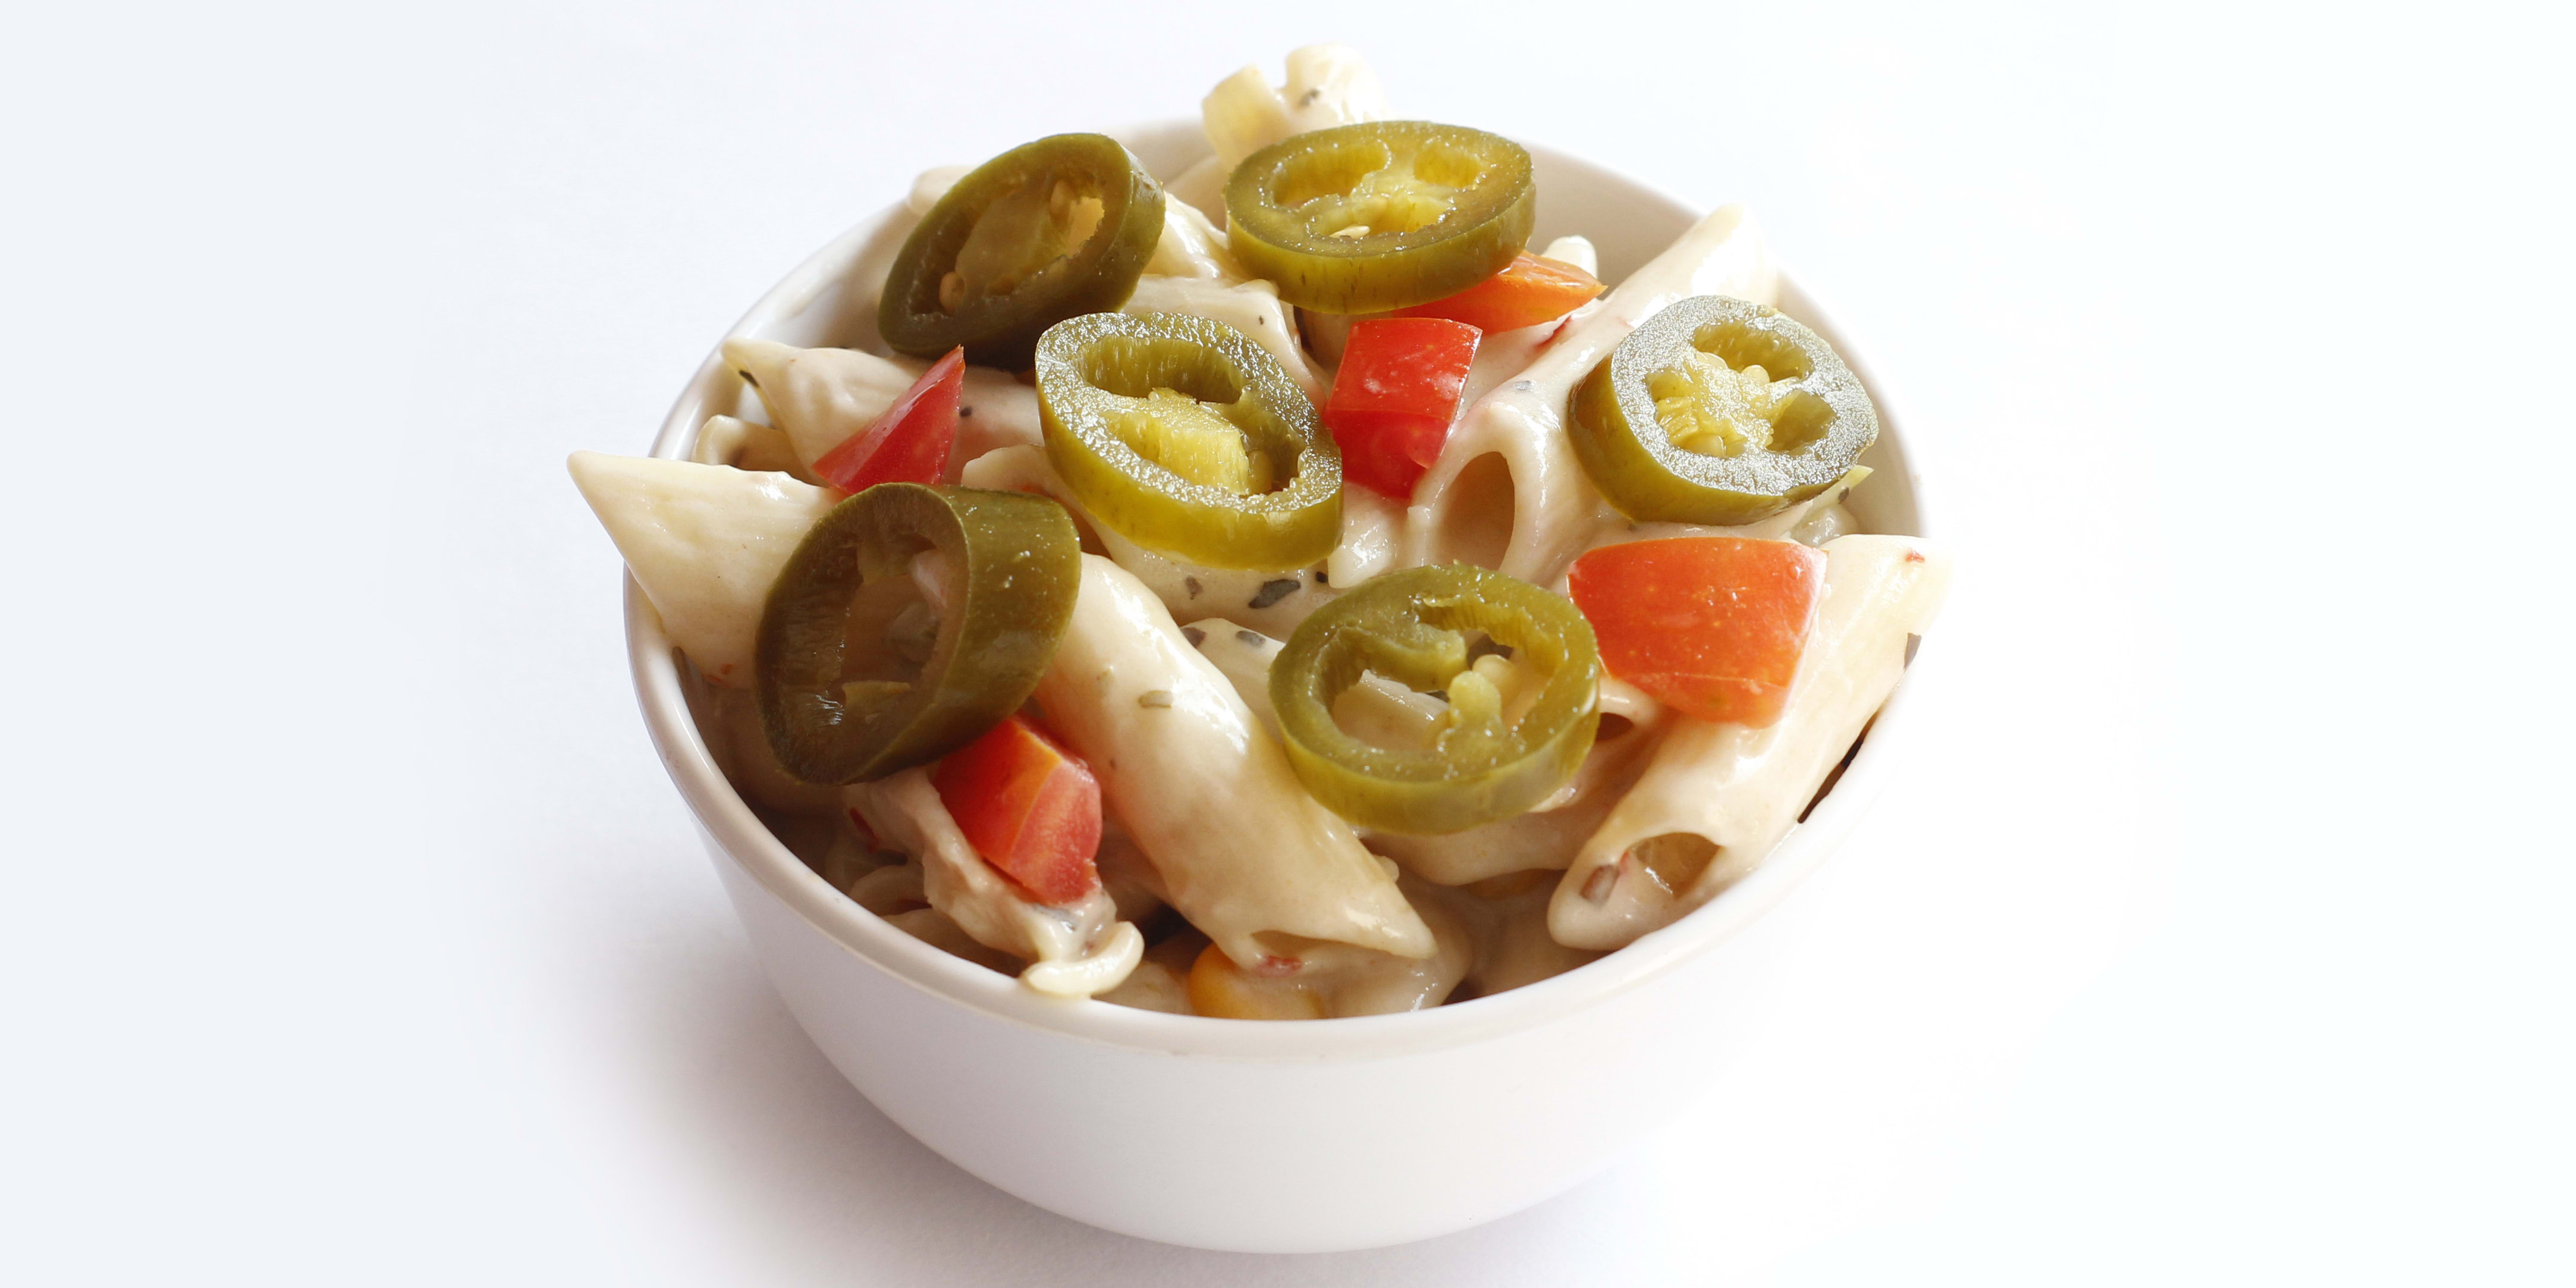 Order food online in kachiguda hyderabad from swiggy pizza unlimited stopboris Choice Image